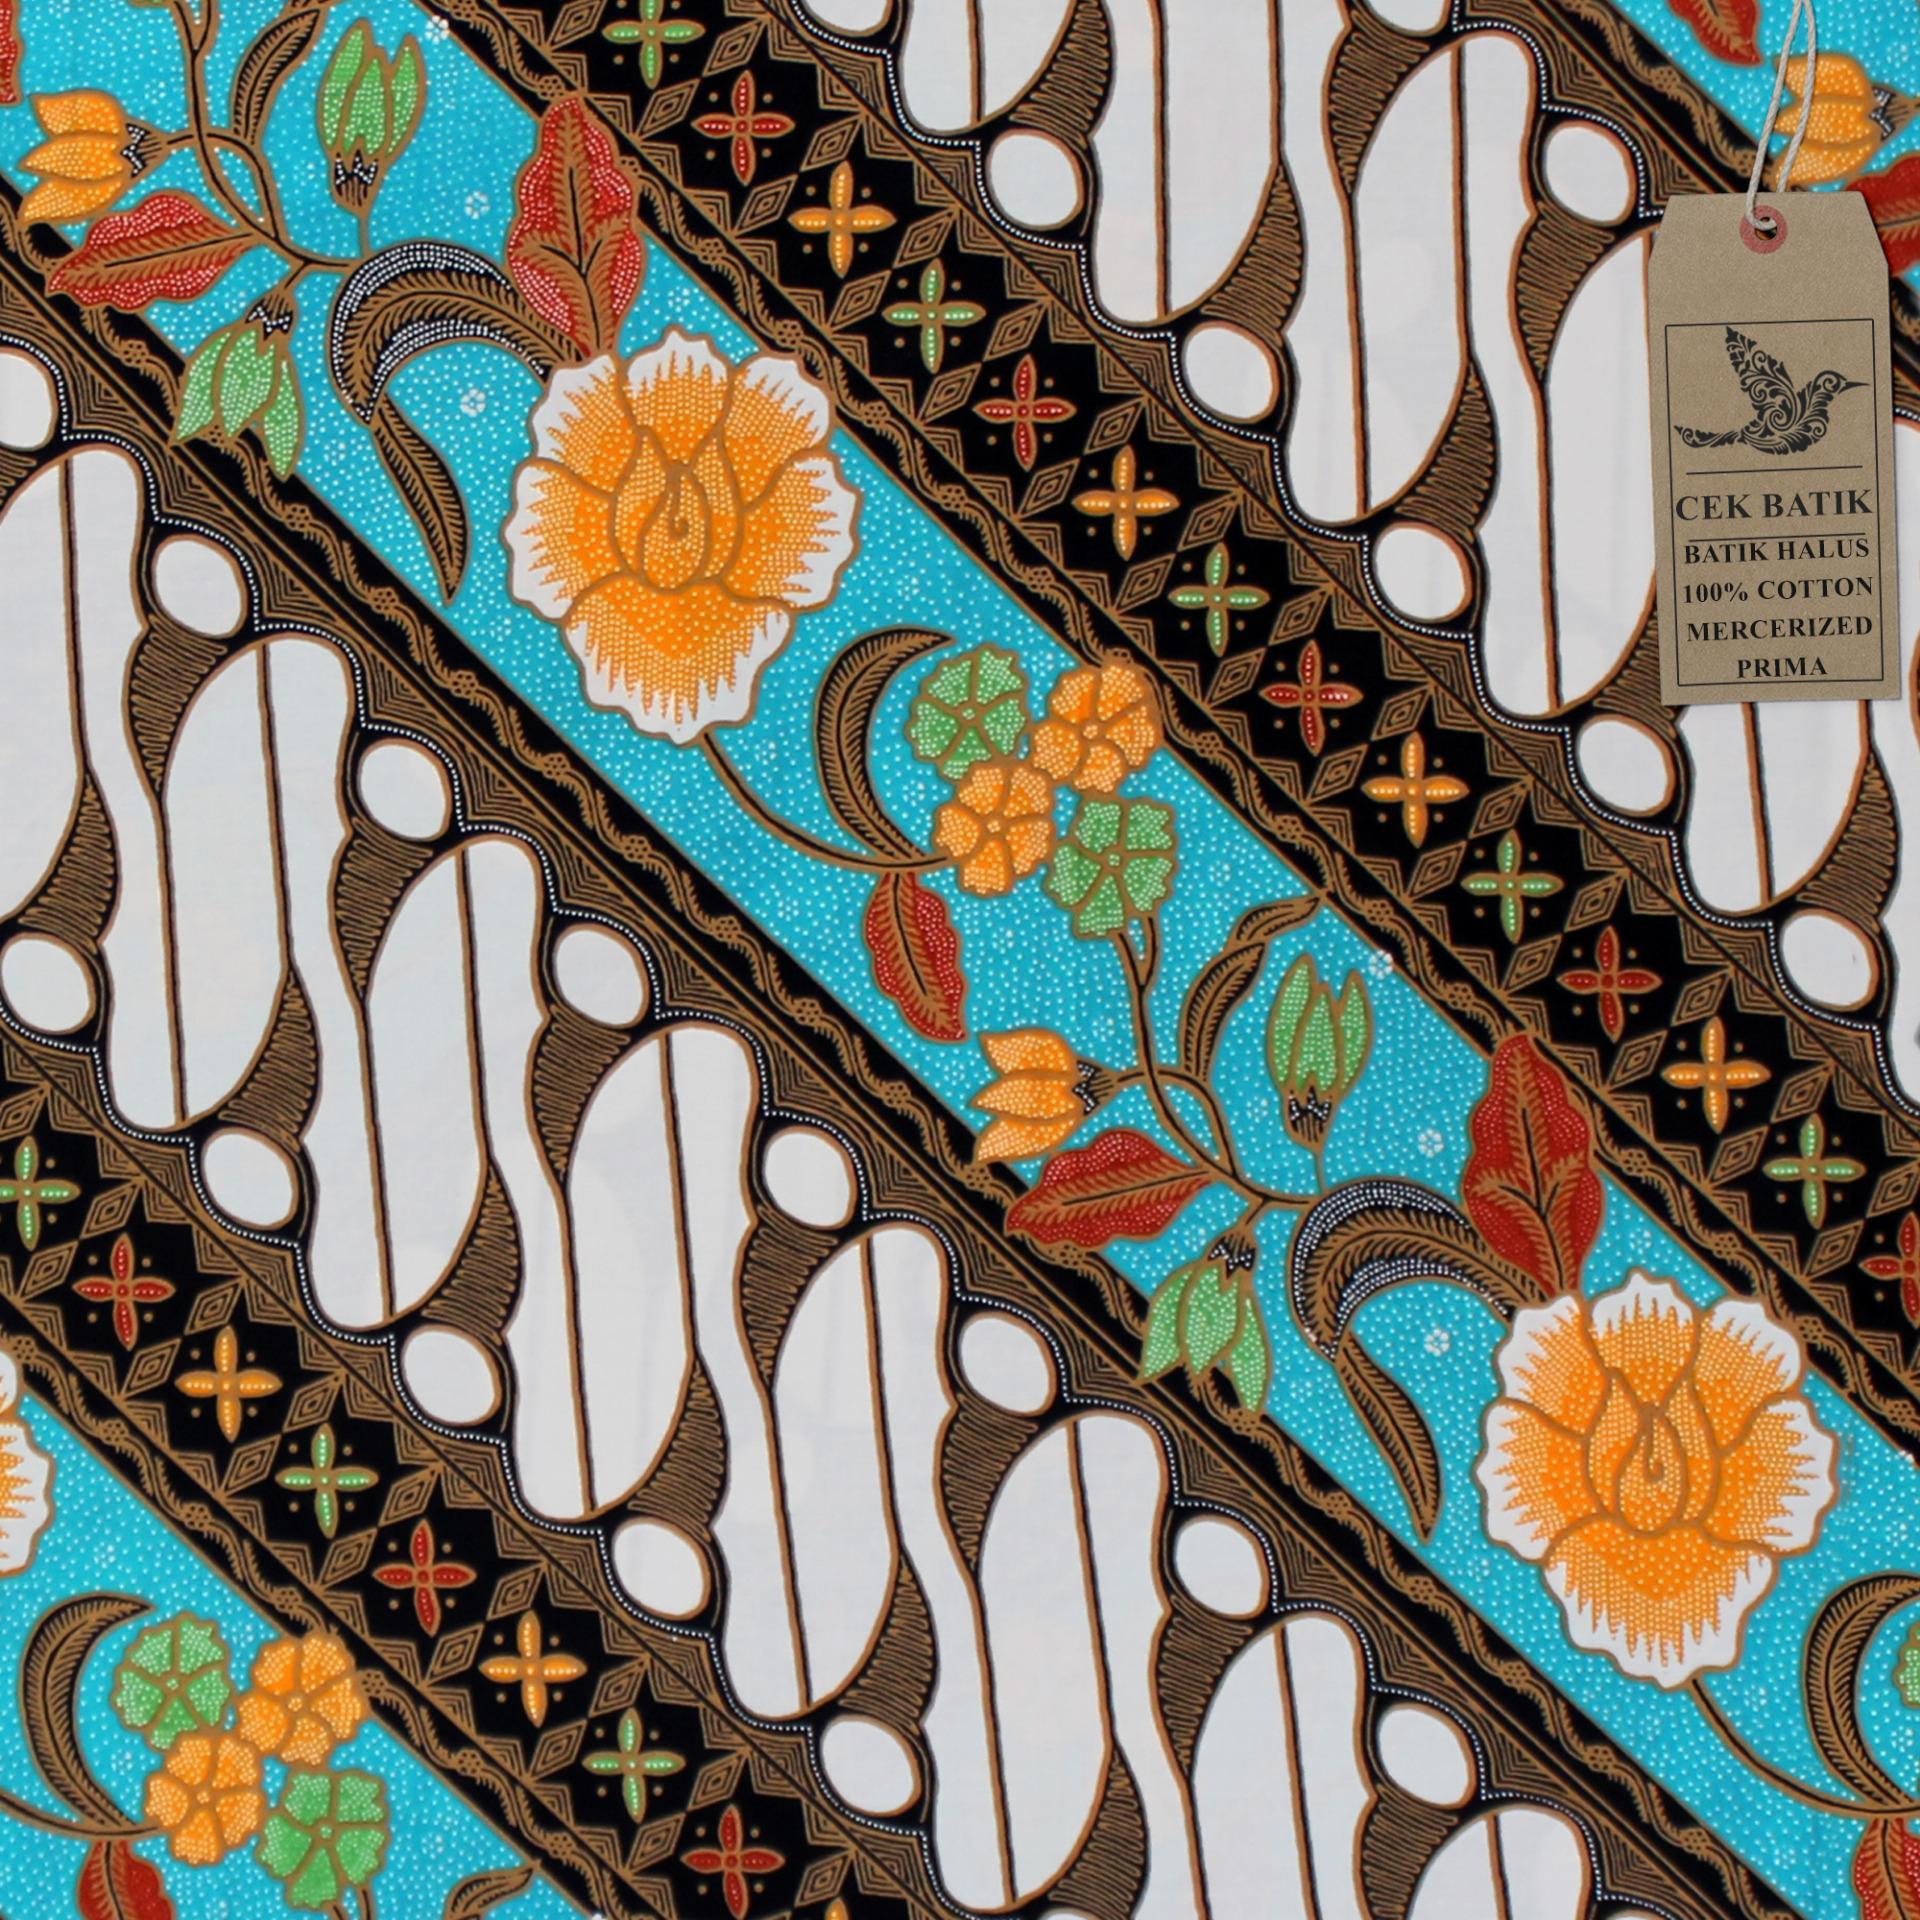 Cek Batik - Kain Batik Motif Etnik & Modern Pesona Parang Mocca Bunga Gading (Soft)